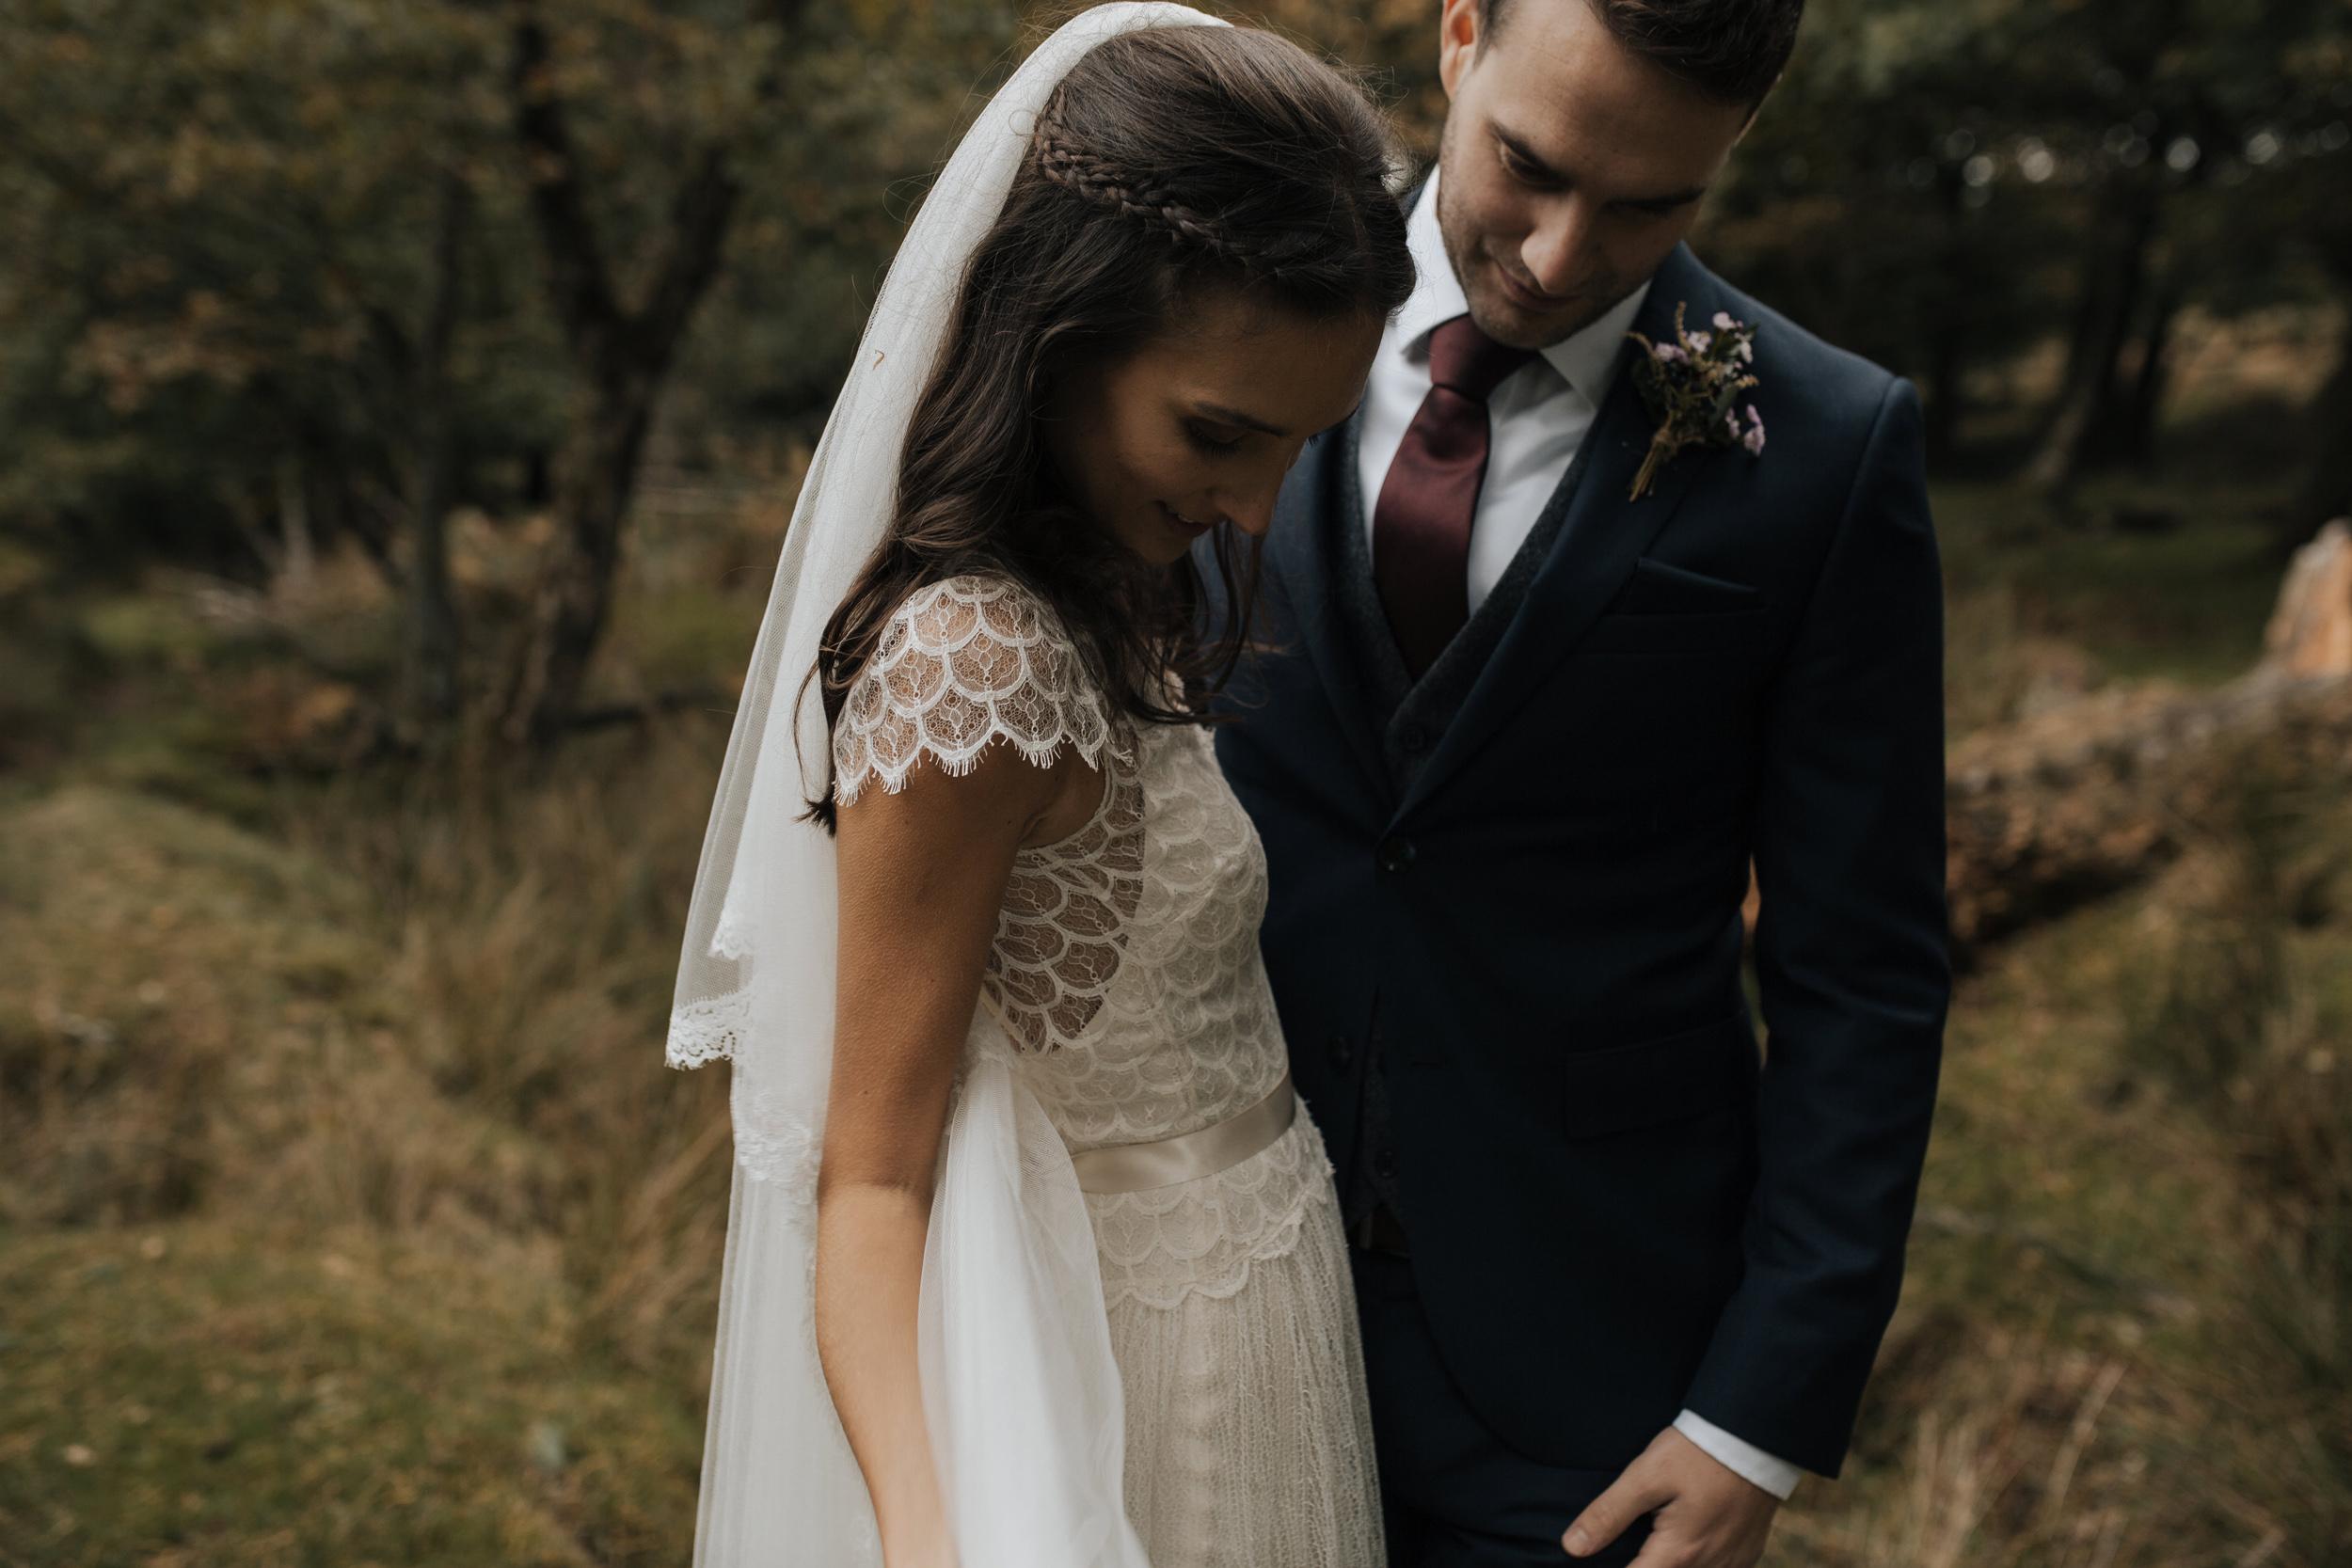 Joasia-Kate-Beaumont-Bohemian-Lace-Wedding-Dress-Peak-District-Sheffield-Wedding-30.jpg